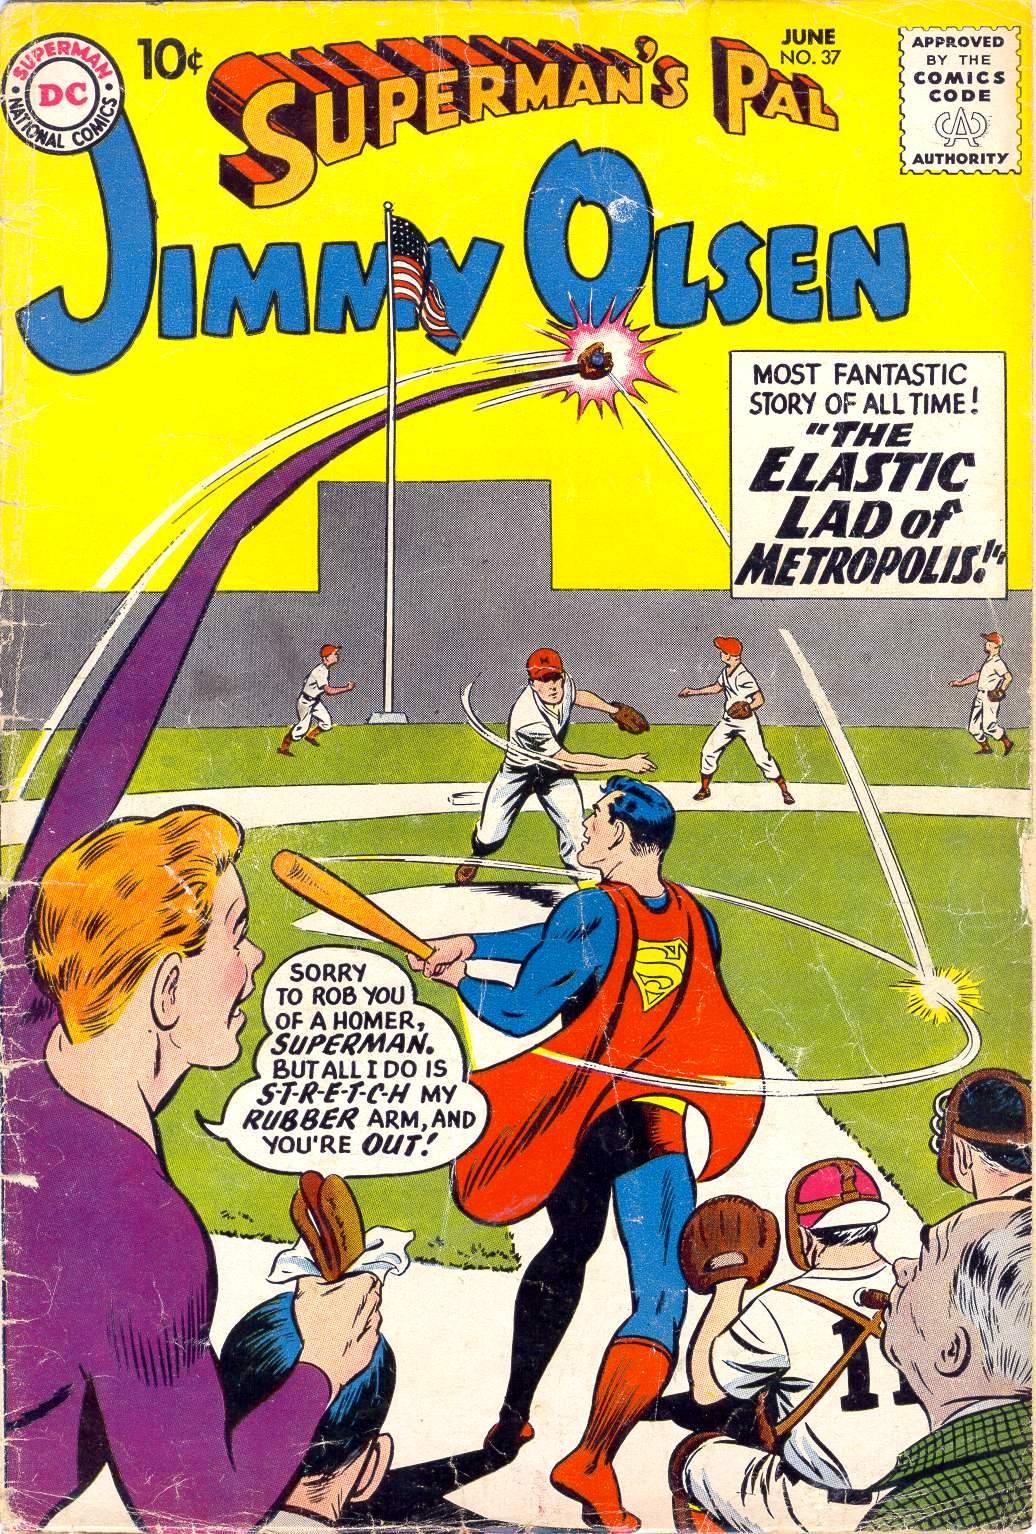 Supermans Pal Jimmy Olsen (1954) 37 Page 1